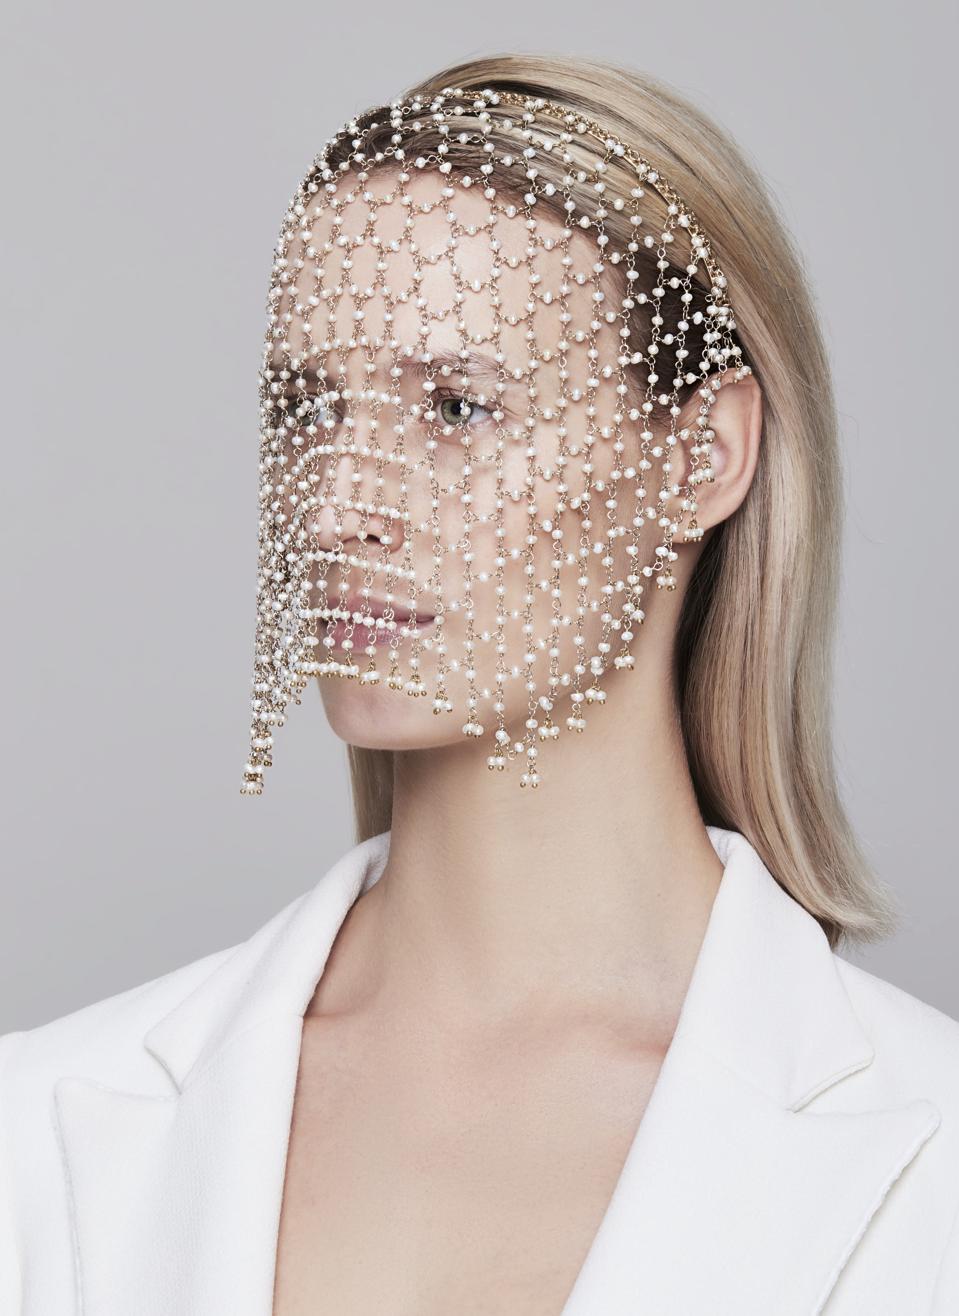 Rosantica's Carmen Headband